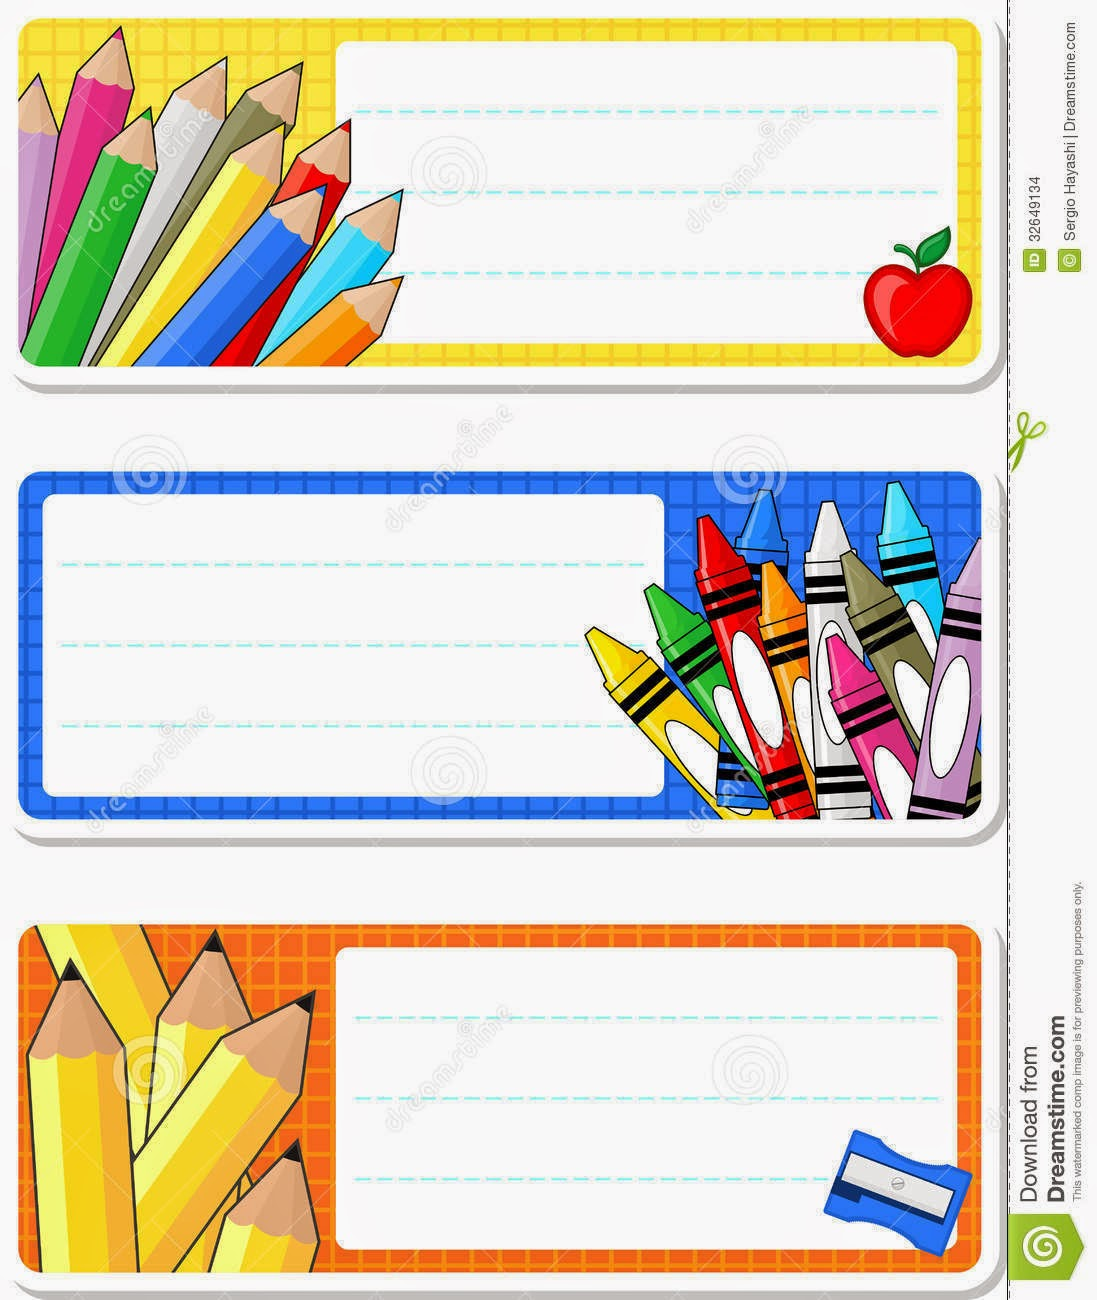 Classroom Design Literature ~ Δως μοι πα στω και ταν γαν κινάσω Σχολικές ετικέτες